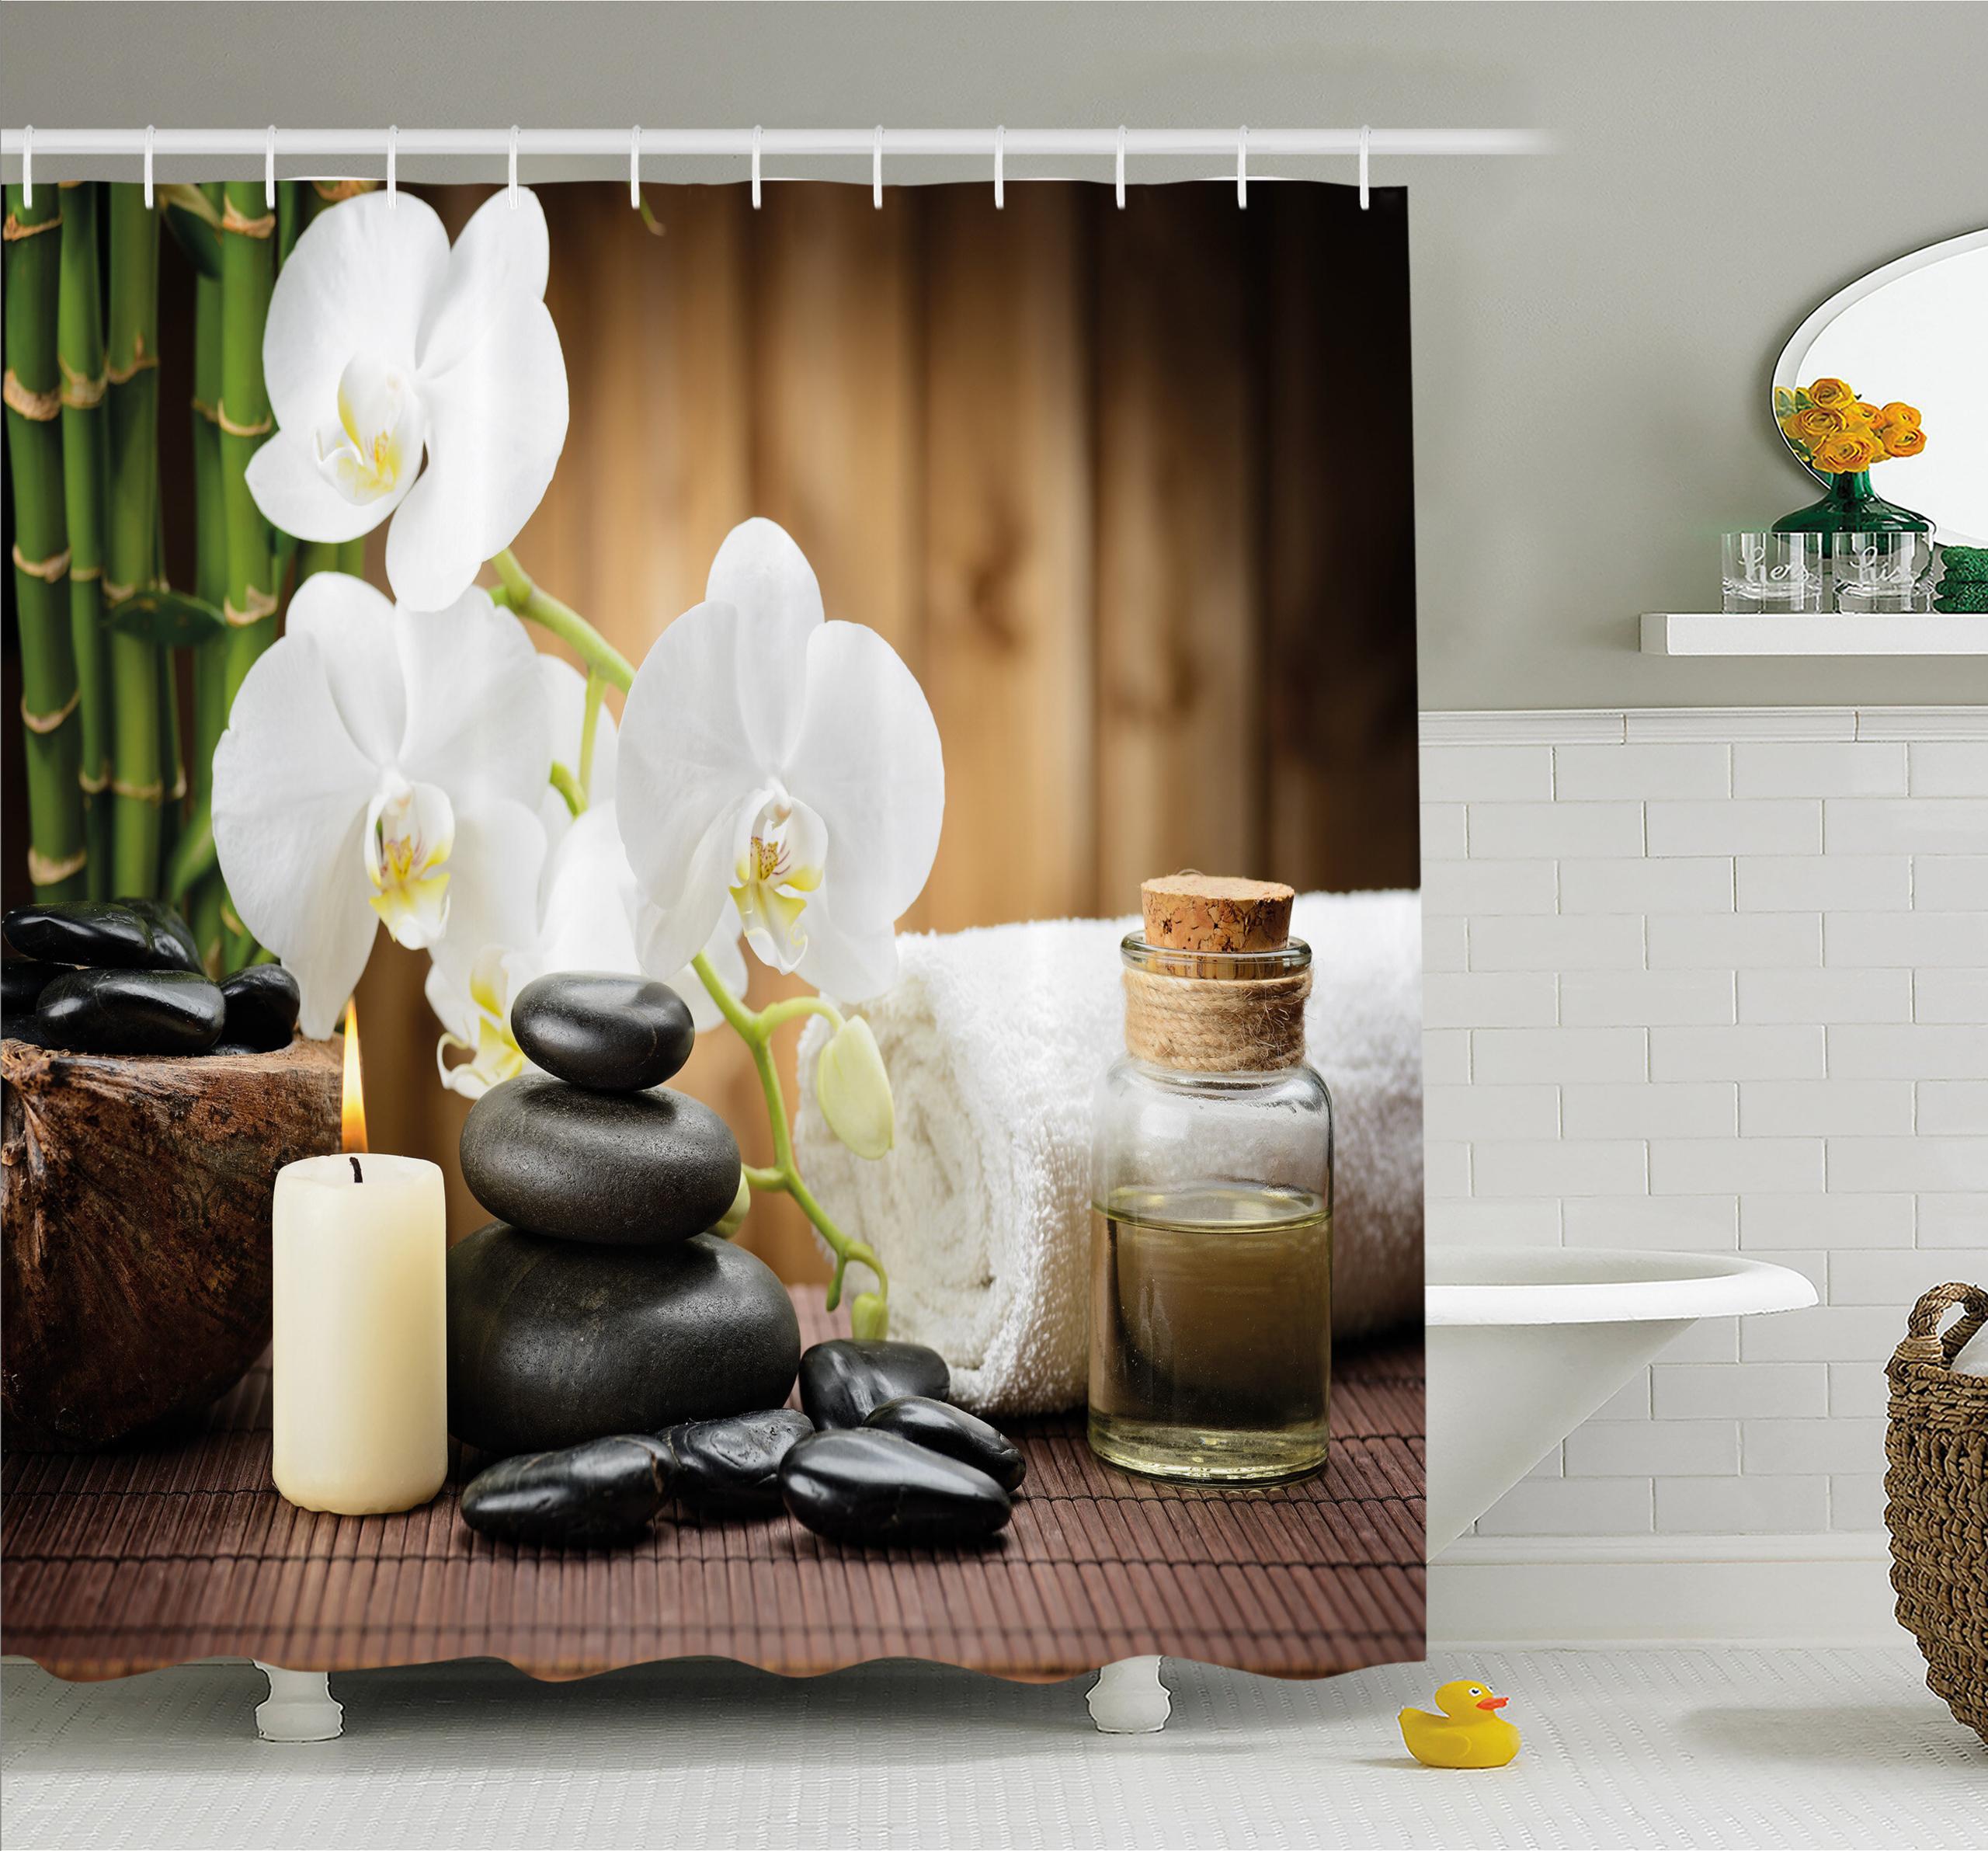 Spa Shower Curtain Hot Rocks Candles Bamboos Print for Bathroom